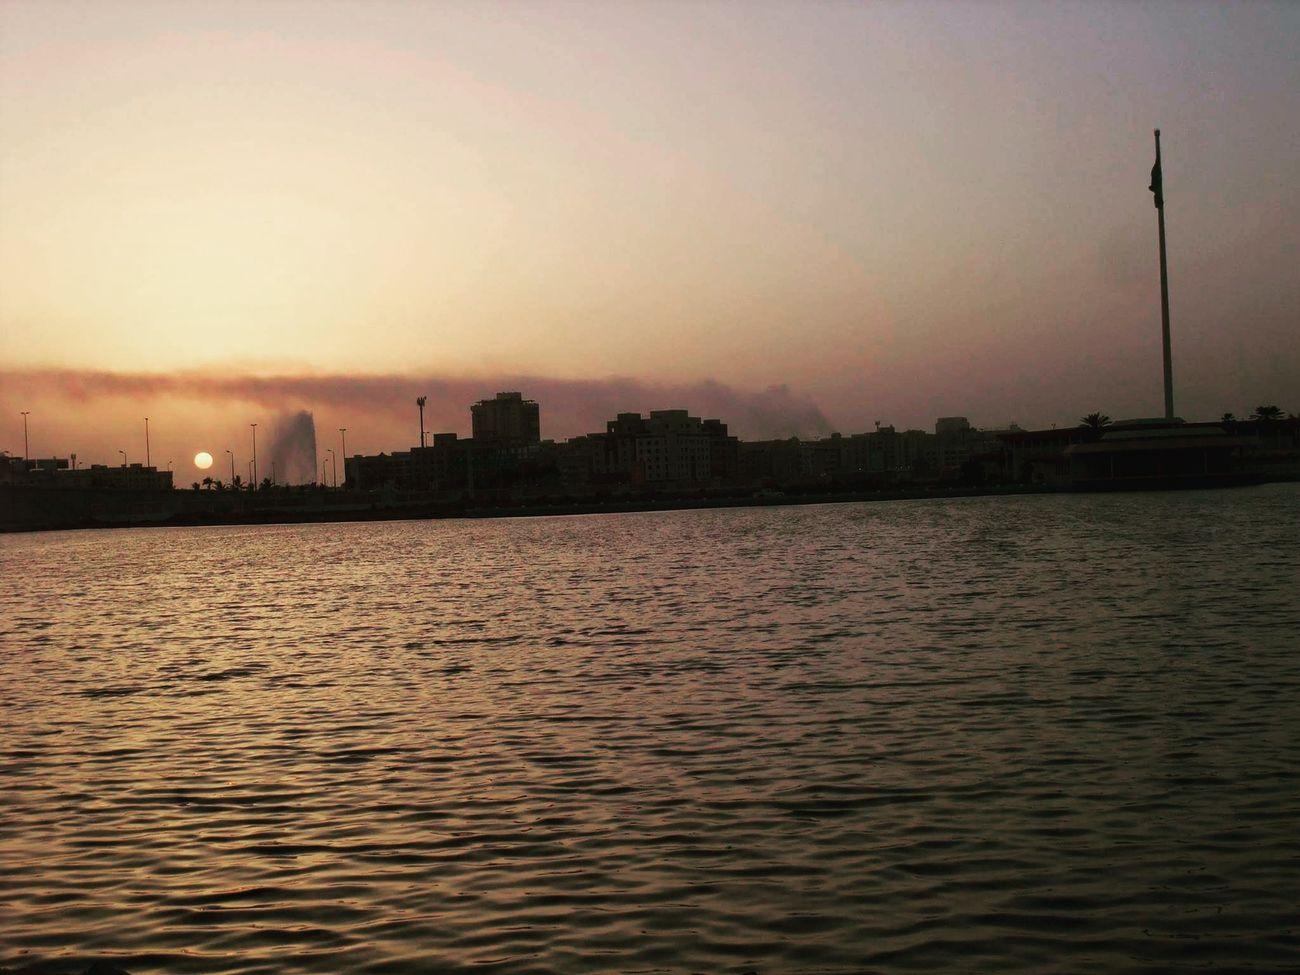 Sunset Water City Outdoors Environment No People Nature Jeddah City Jeddah😍❤️ Saudi Arabia 18YearsOld First Eyeem Photo